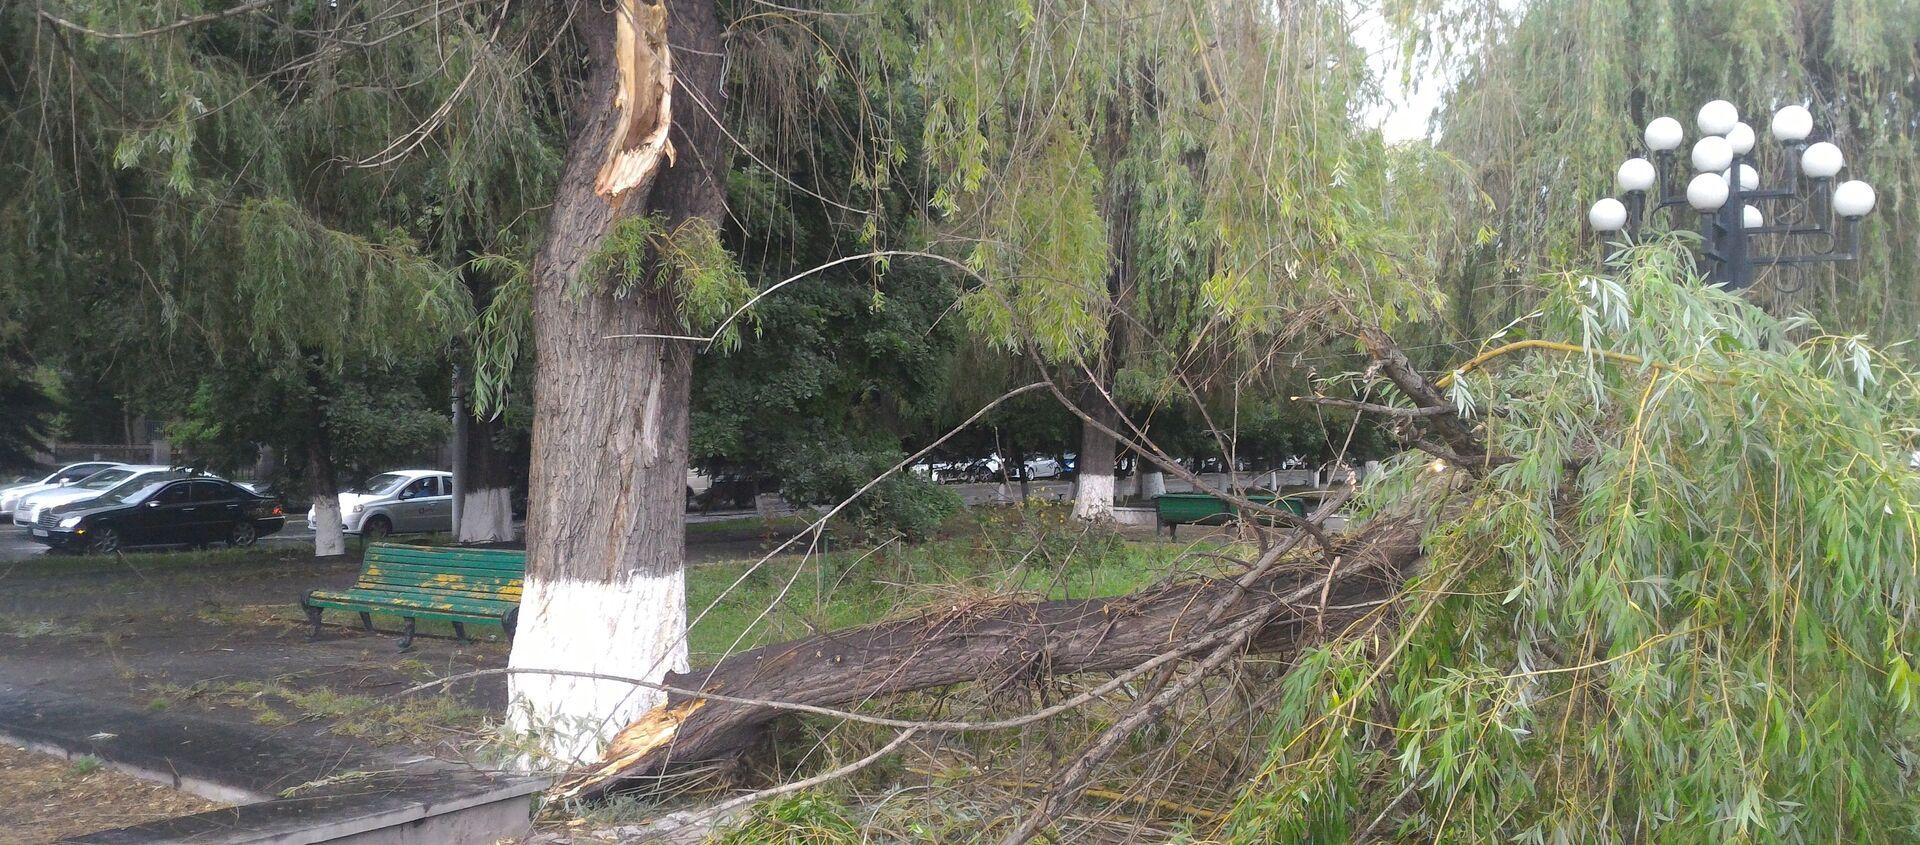 Сильный ветер в Ереване повалил деревья - Sputnik Արմենիա, 1920, 03.04.2018